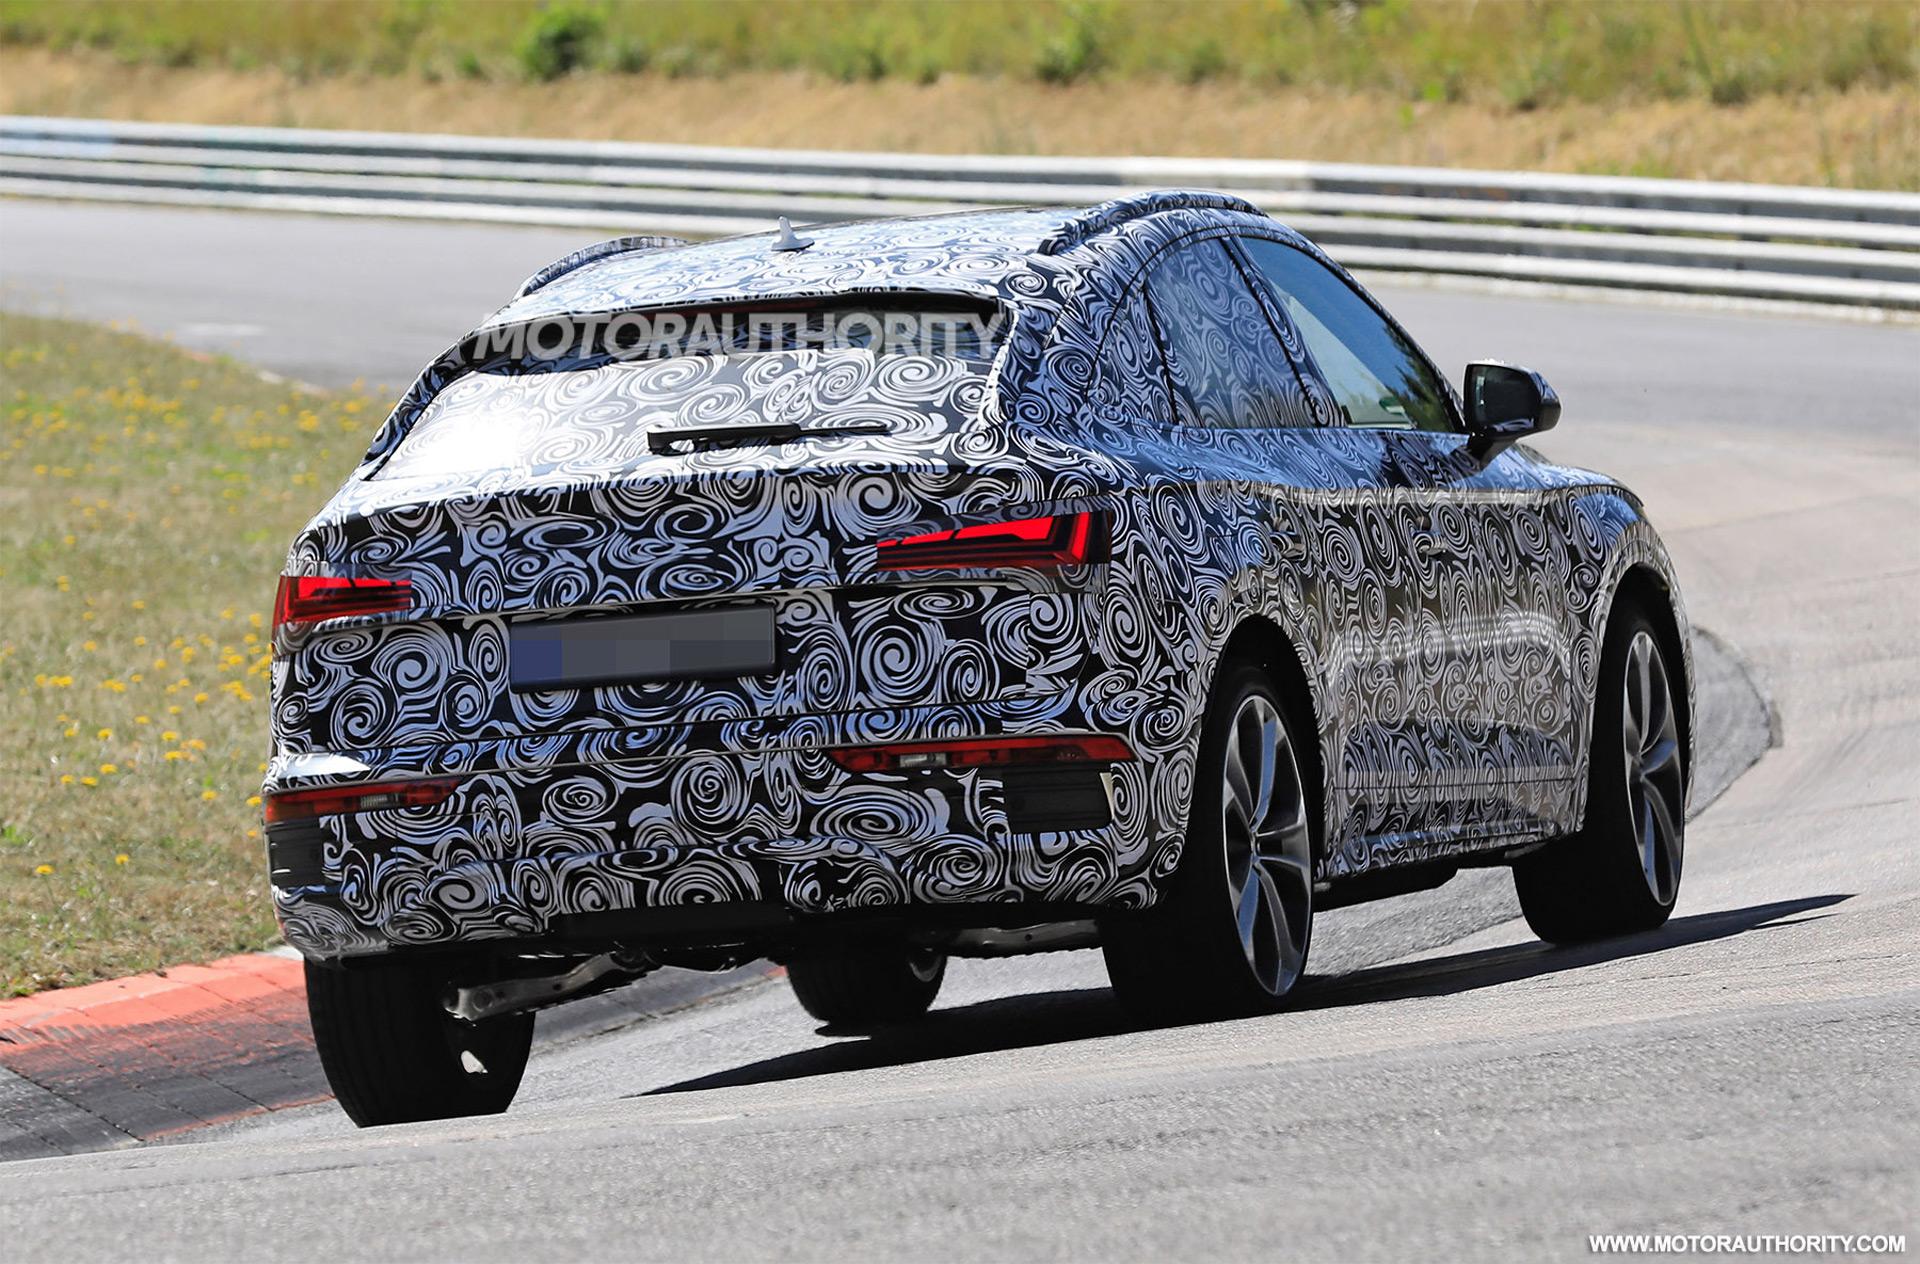 2020 - [Audi] Q5 Sportback - Page 7 2021-audi-q5-sportback-spy-shots--picture-credits-baldauf-sb-medien_100753284_h